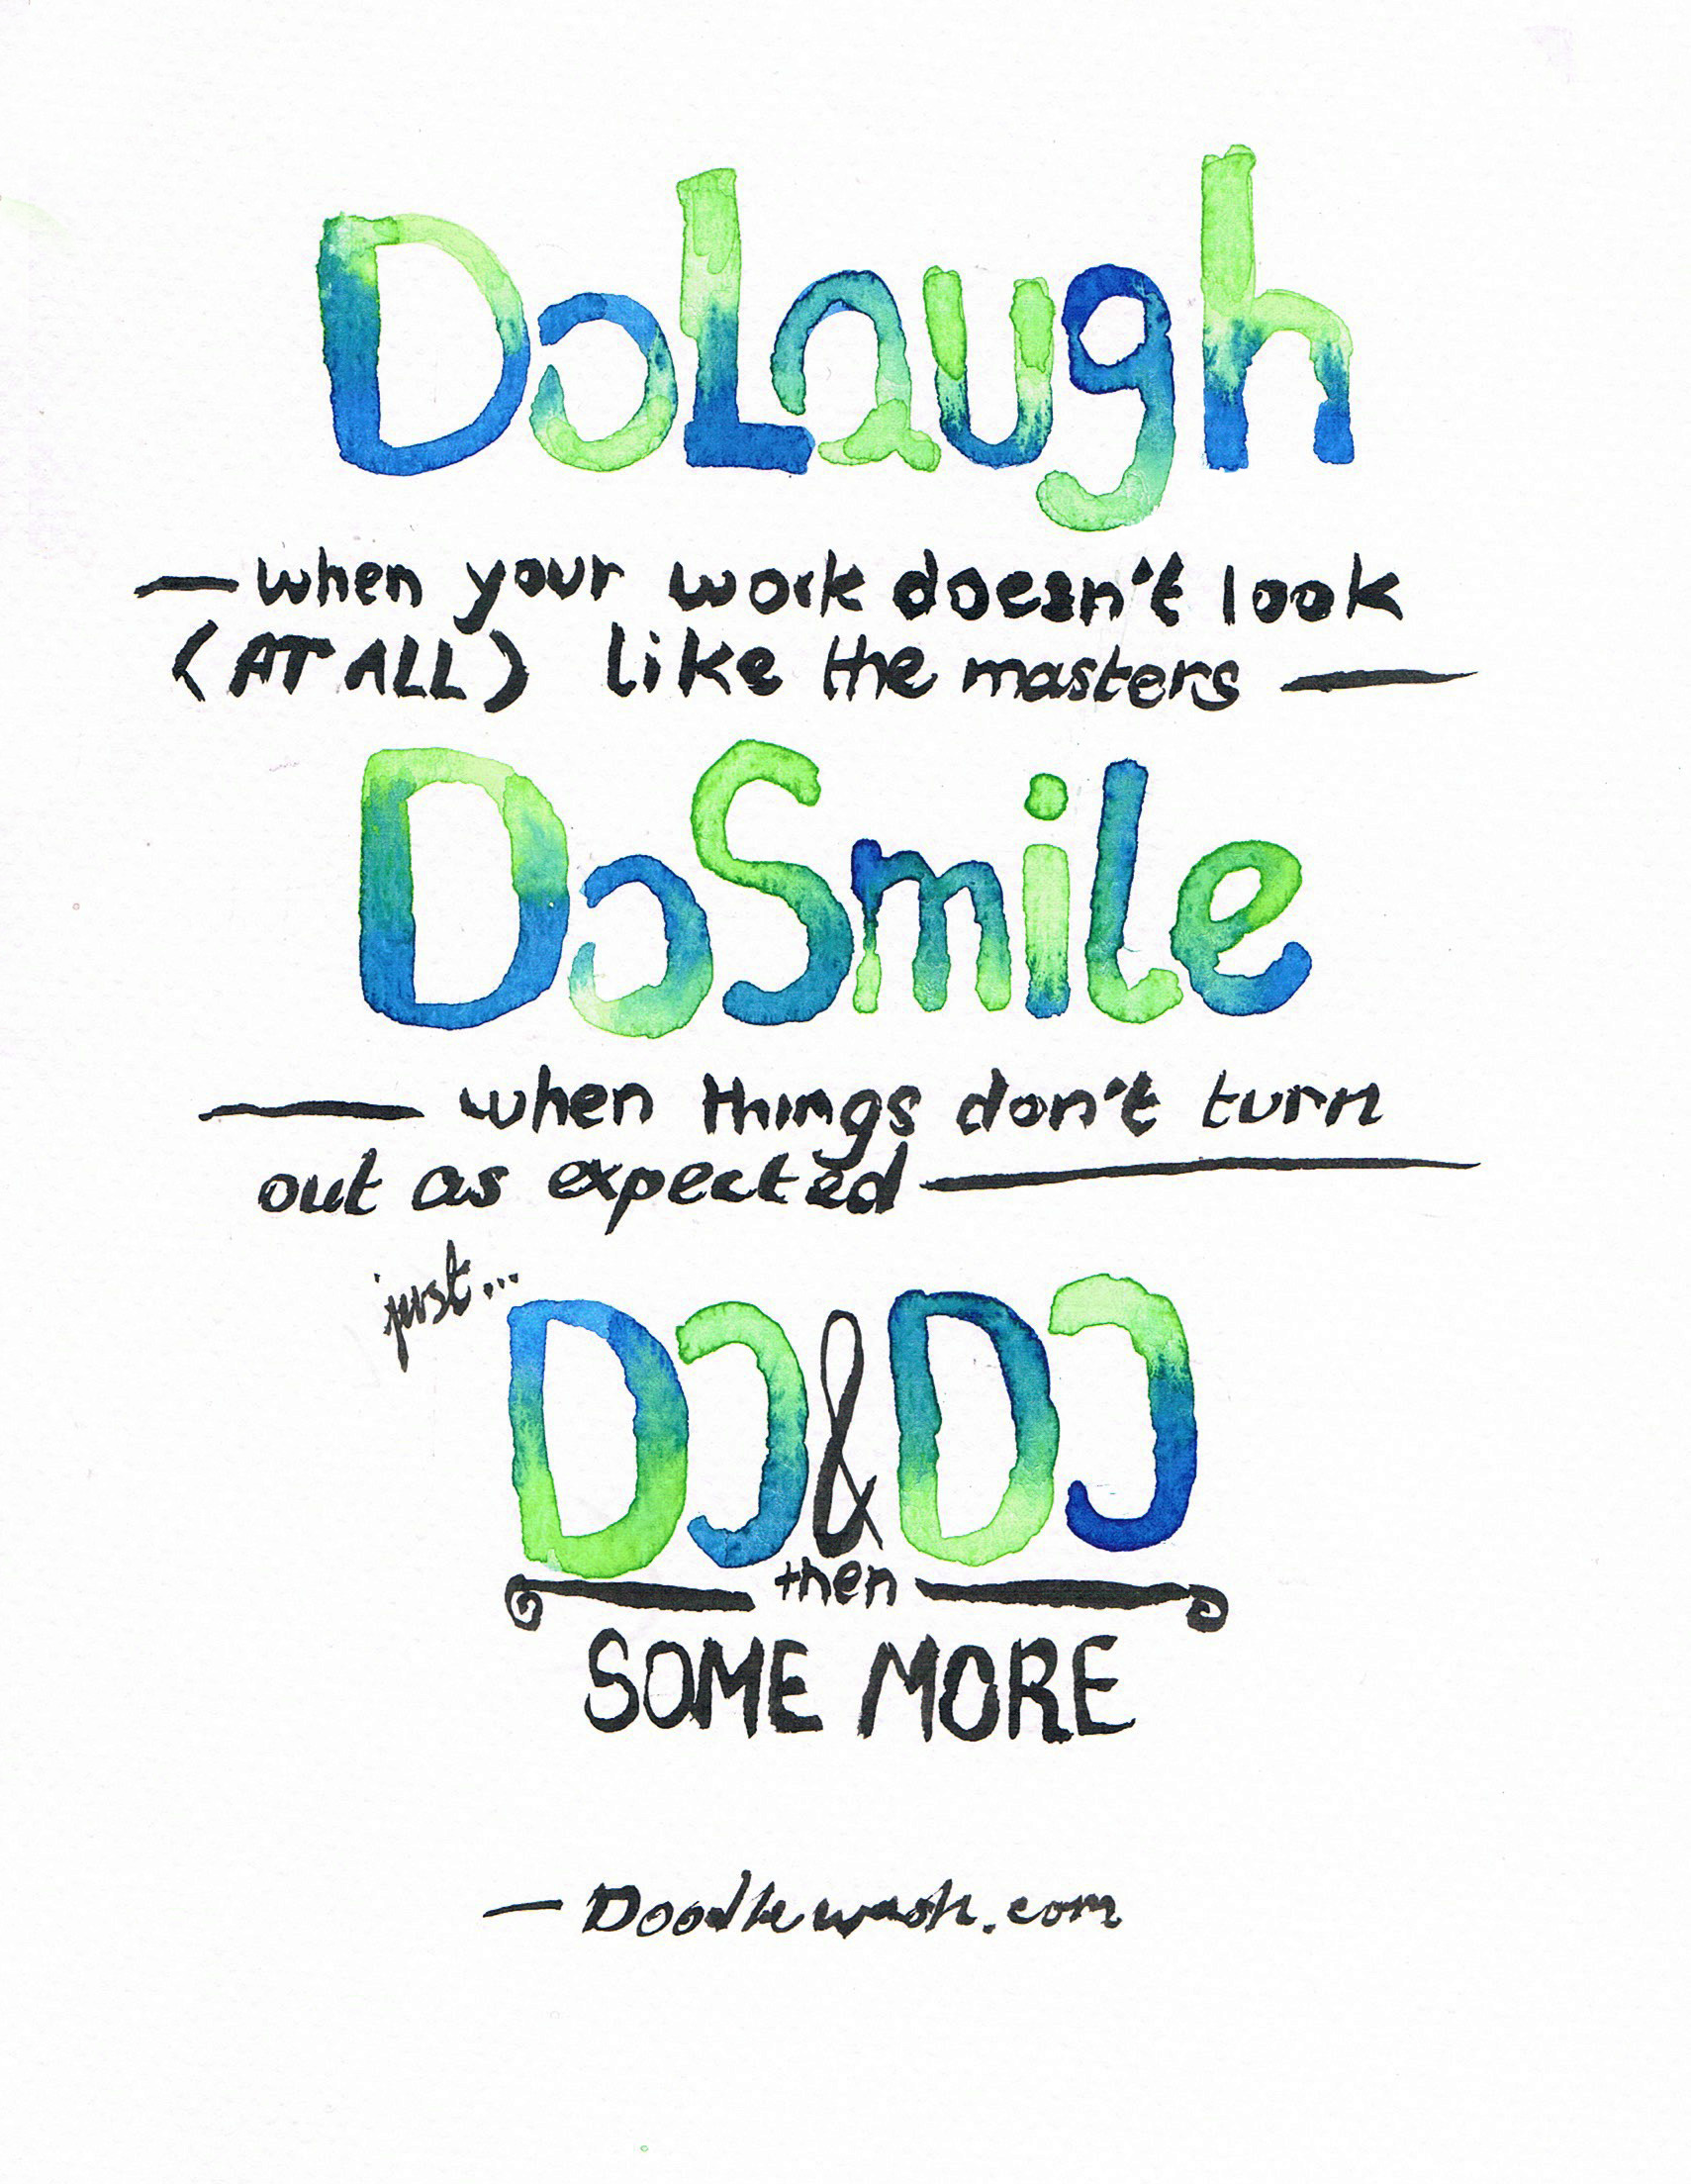 Lessons In Doodlewashing: Inspiration Is Rewarding